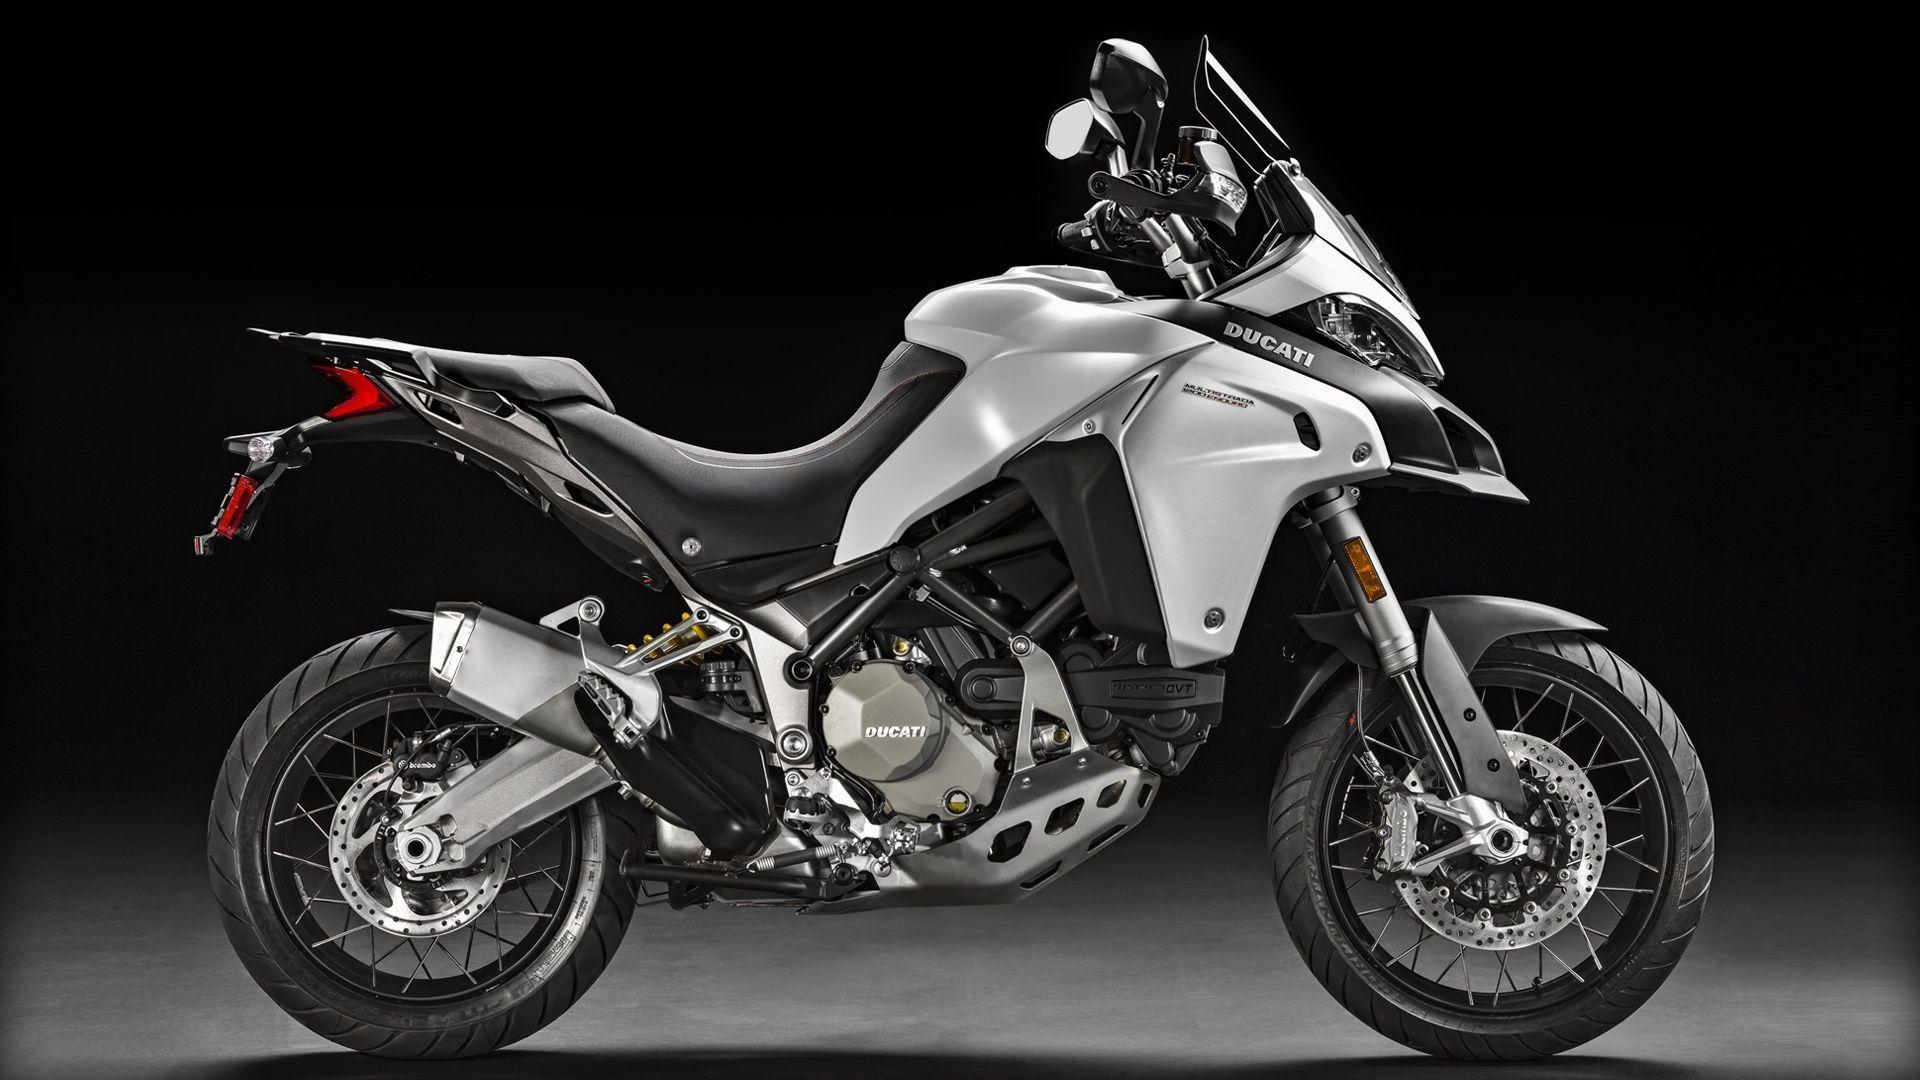 2016 Ducati Multistrada 1200 Enduro   Multistrada 1200 Enduro - Side View